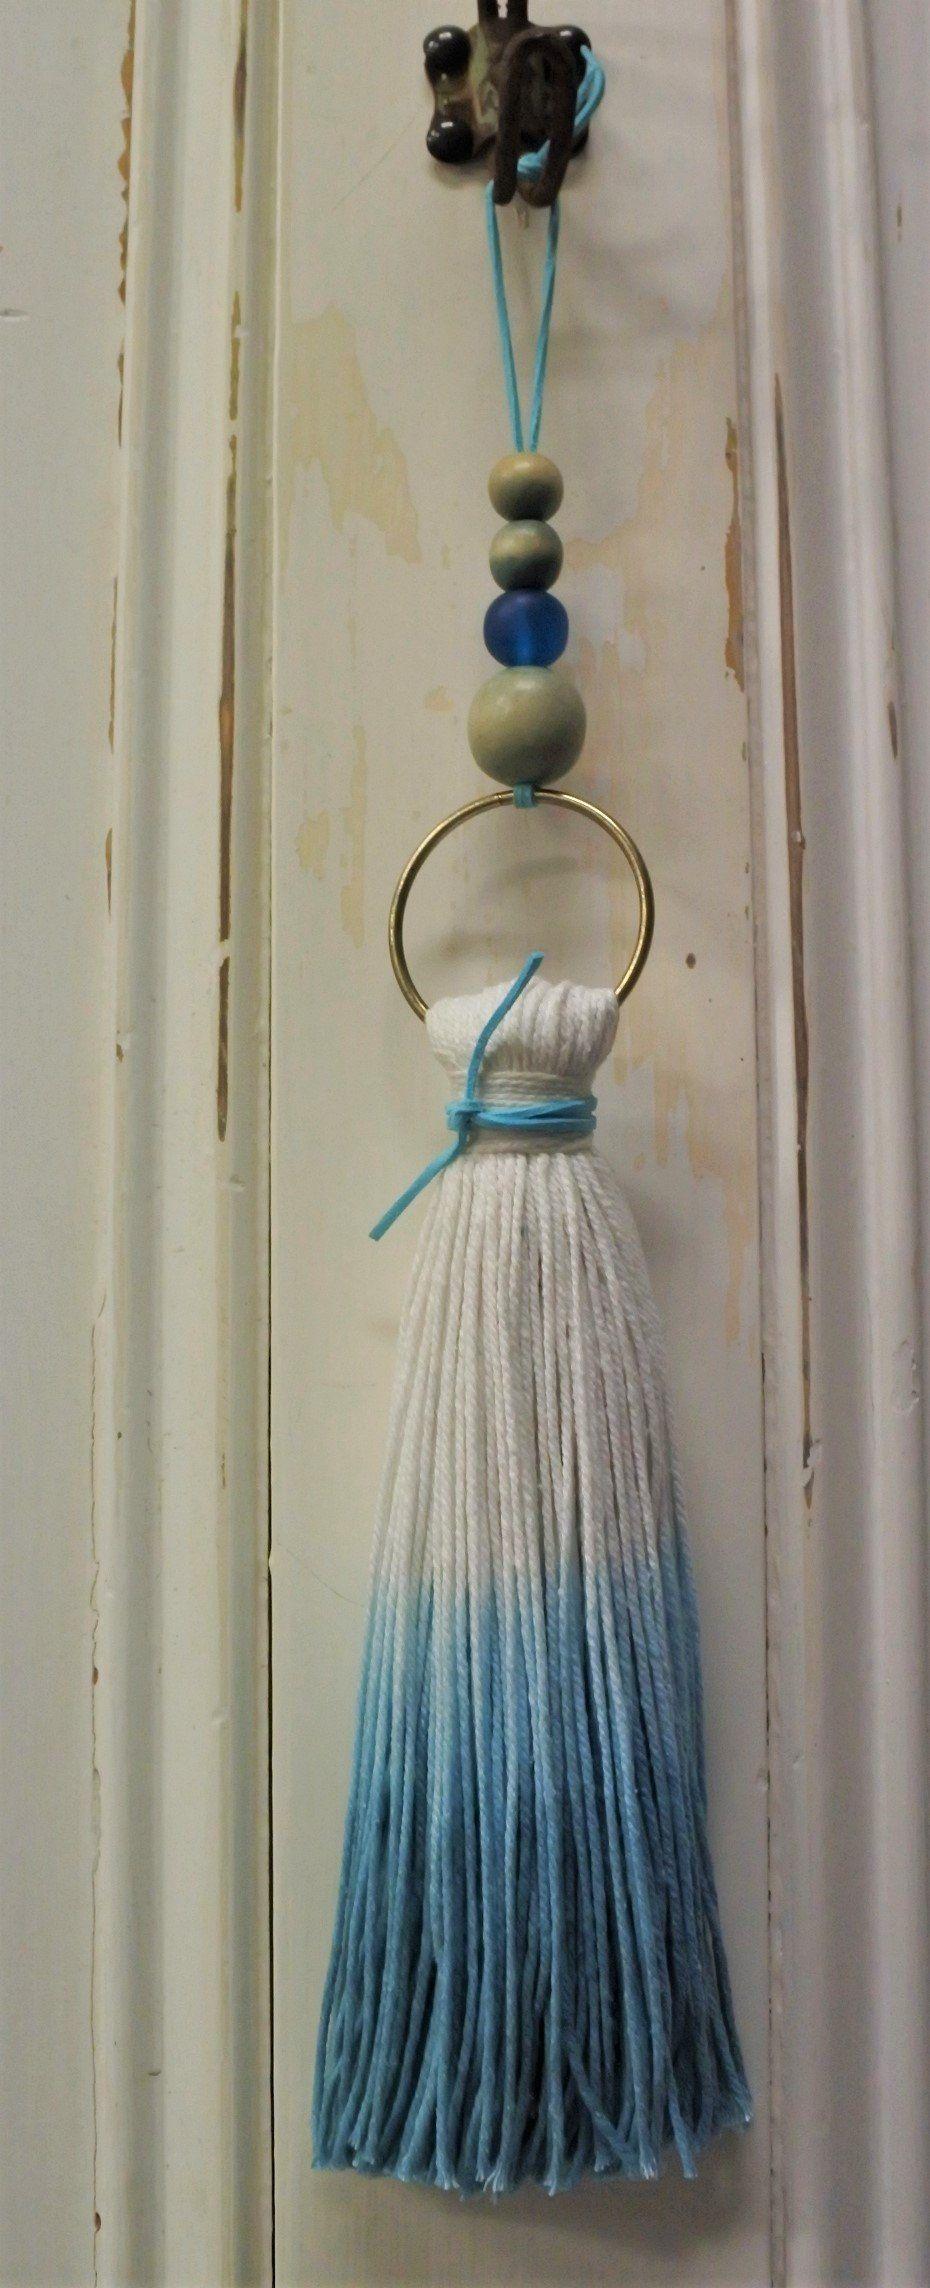 Dip Dyed Tassel Boho Style Beach Decor Coastal Blue Large Cotton By Misterandmadu On Etsy